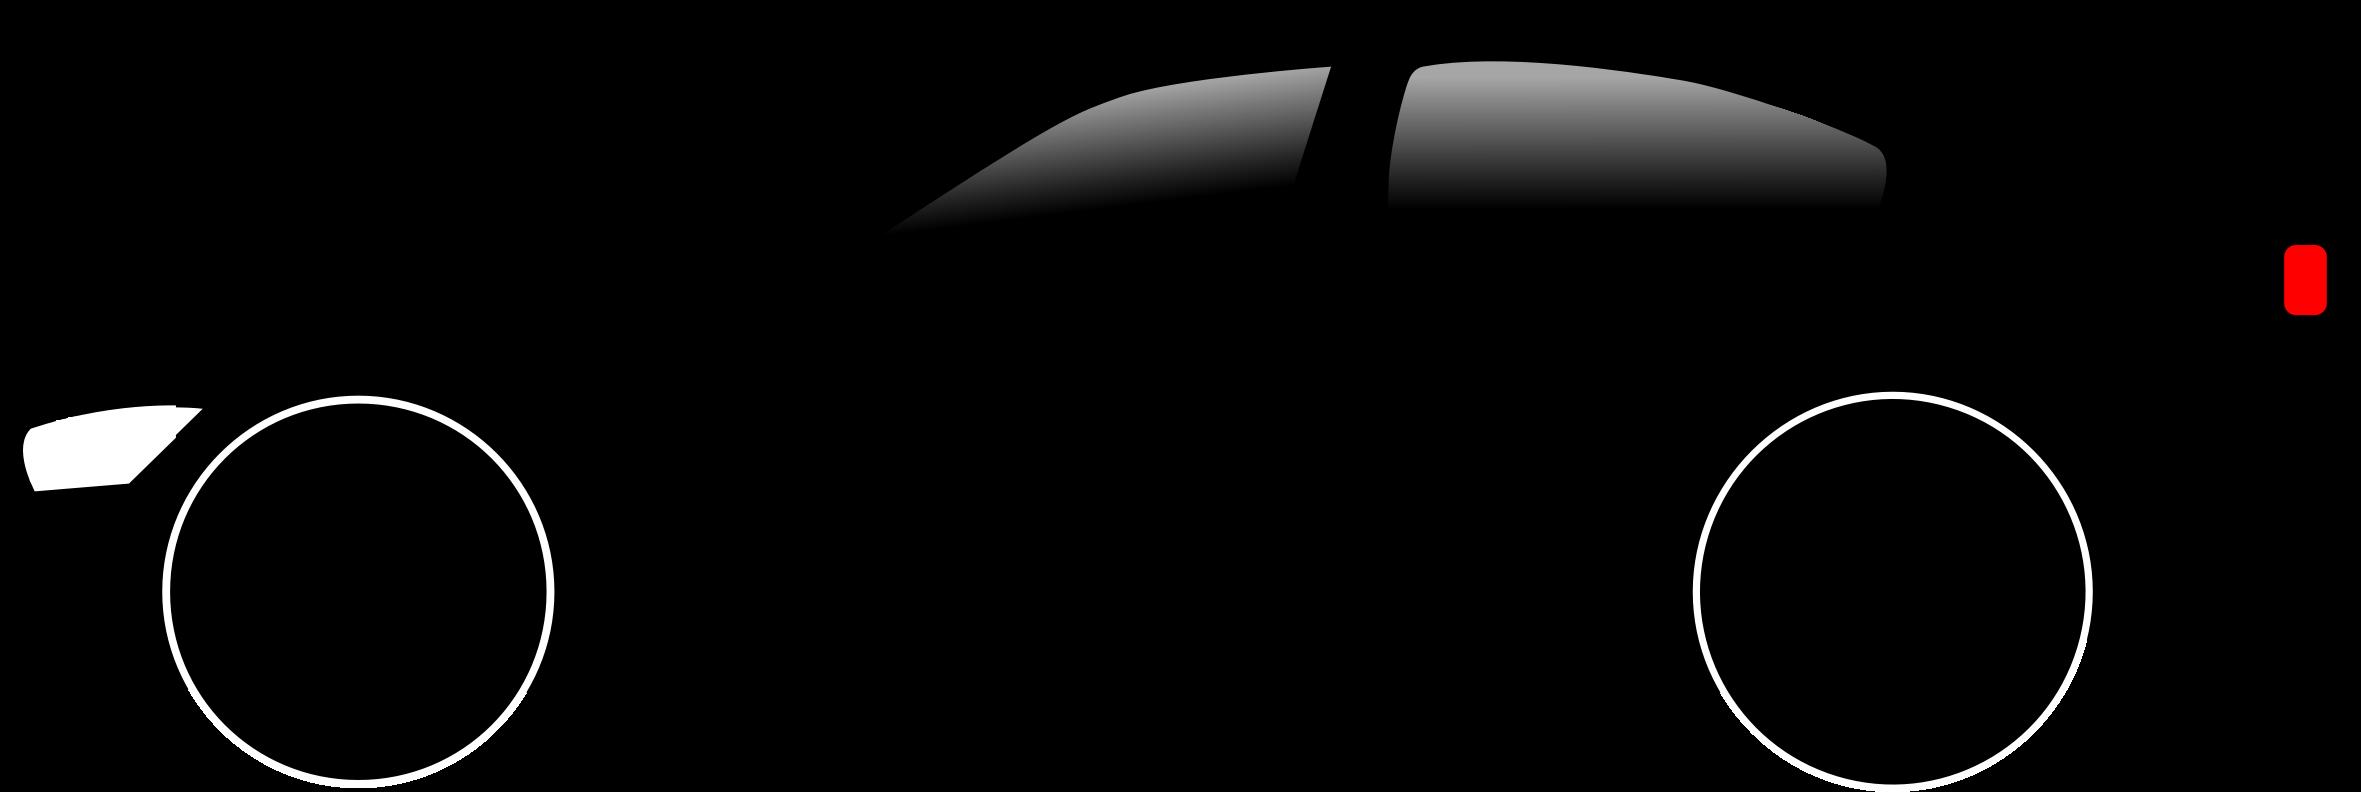 Car black and white car black clipart clipartfest.